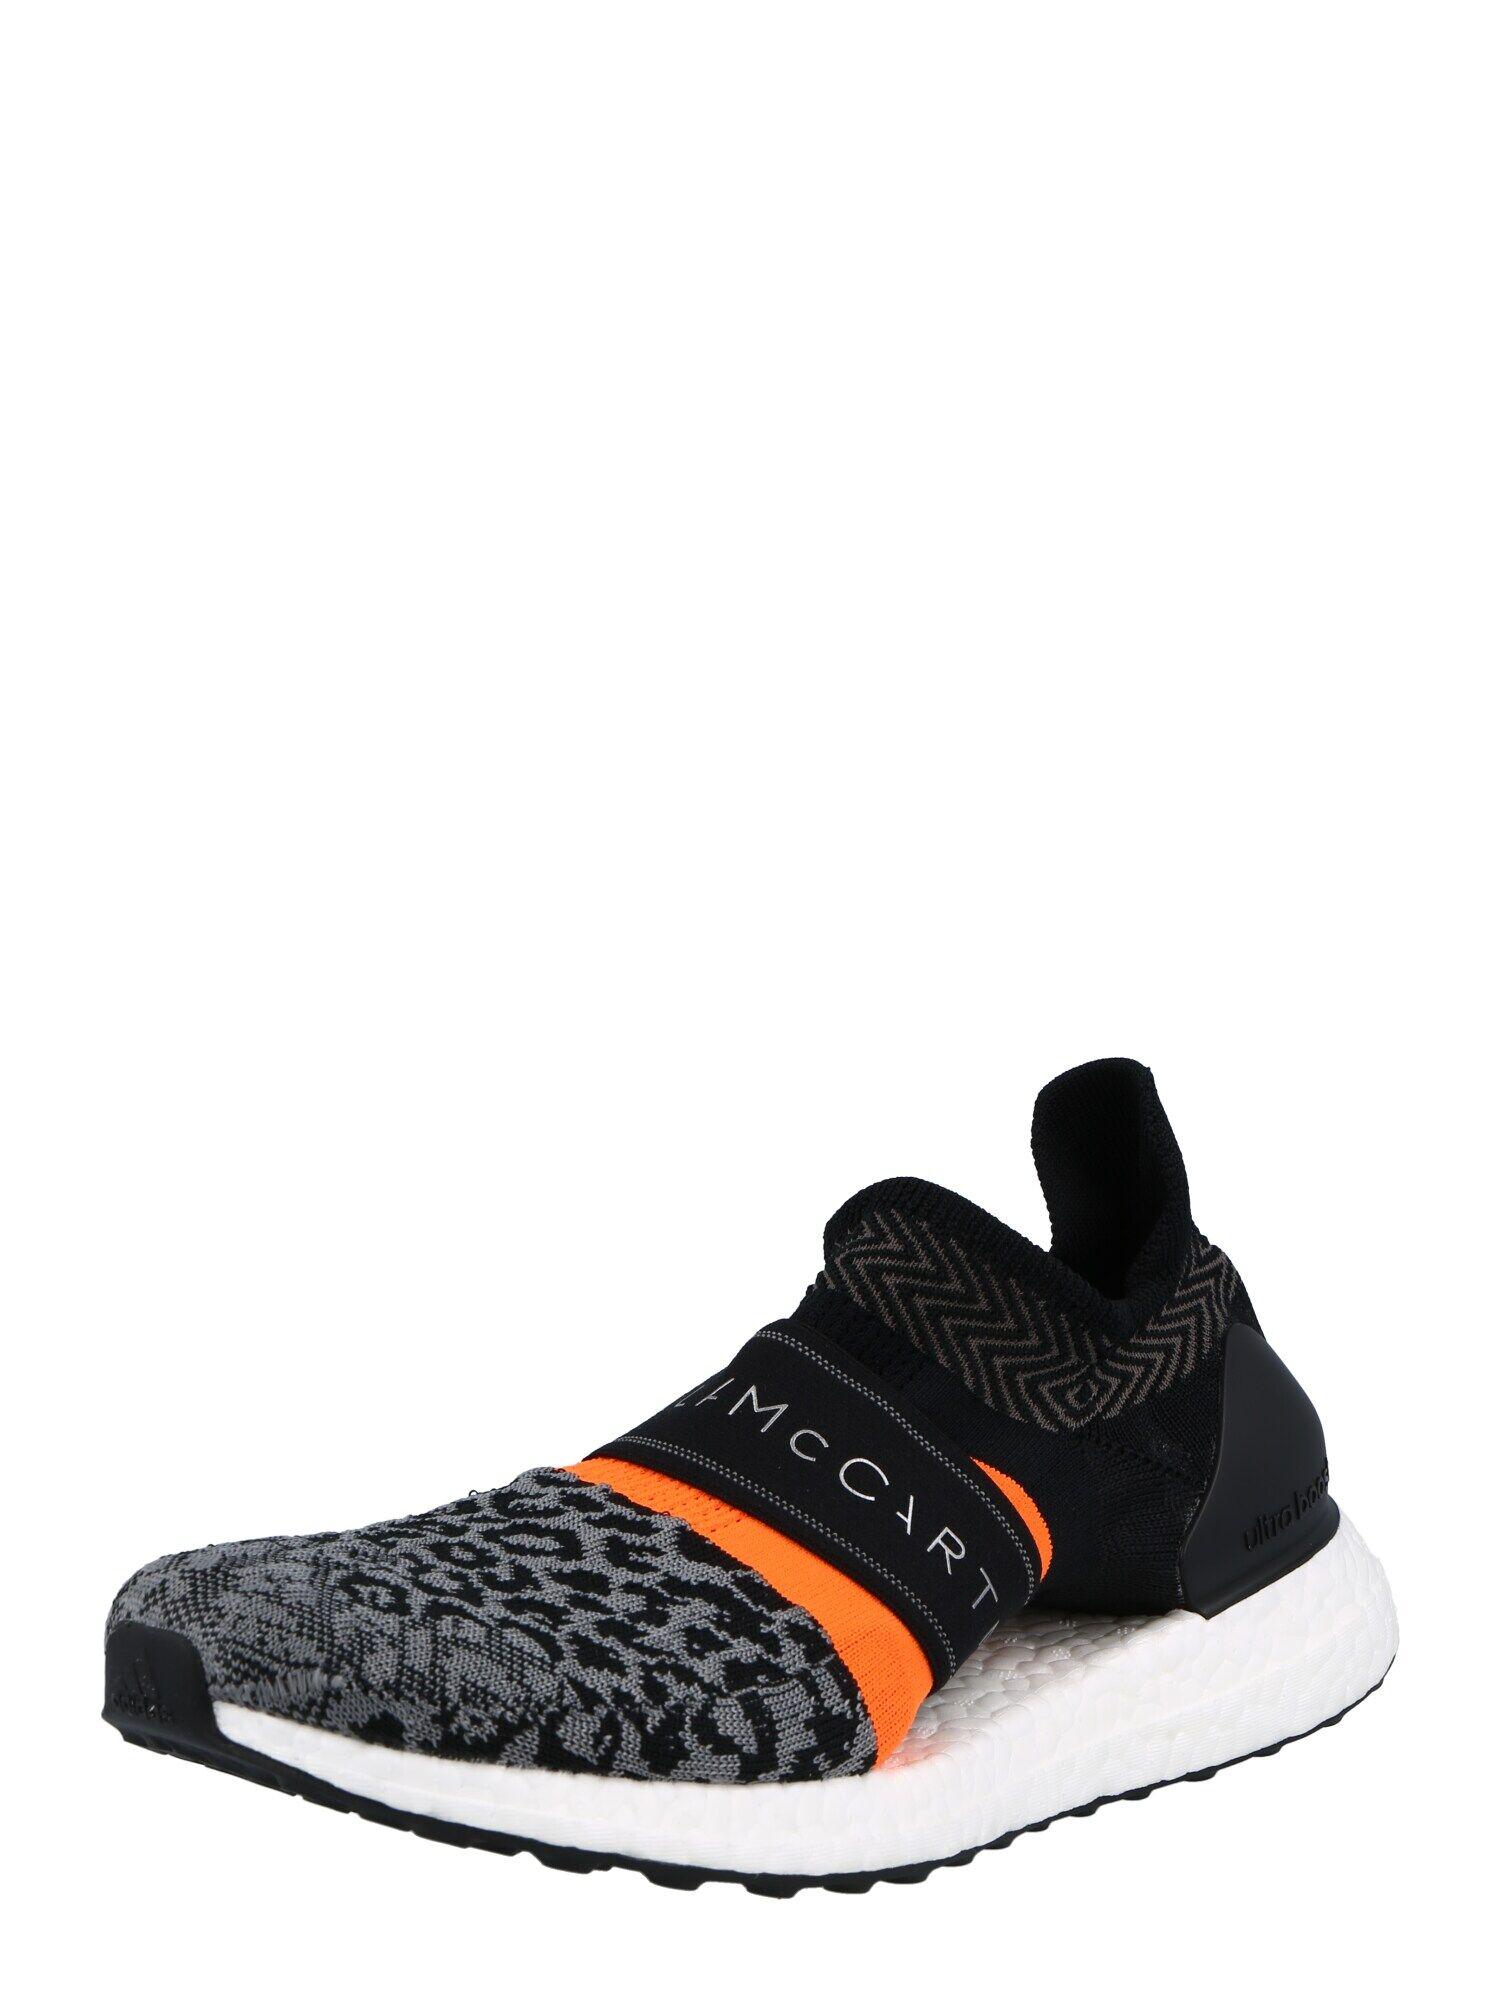 adidas by stella mccartney scarpa sportiva nero